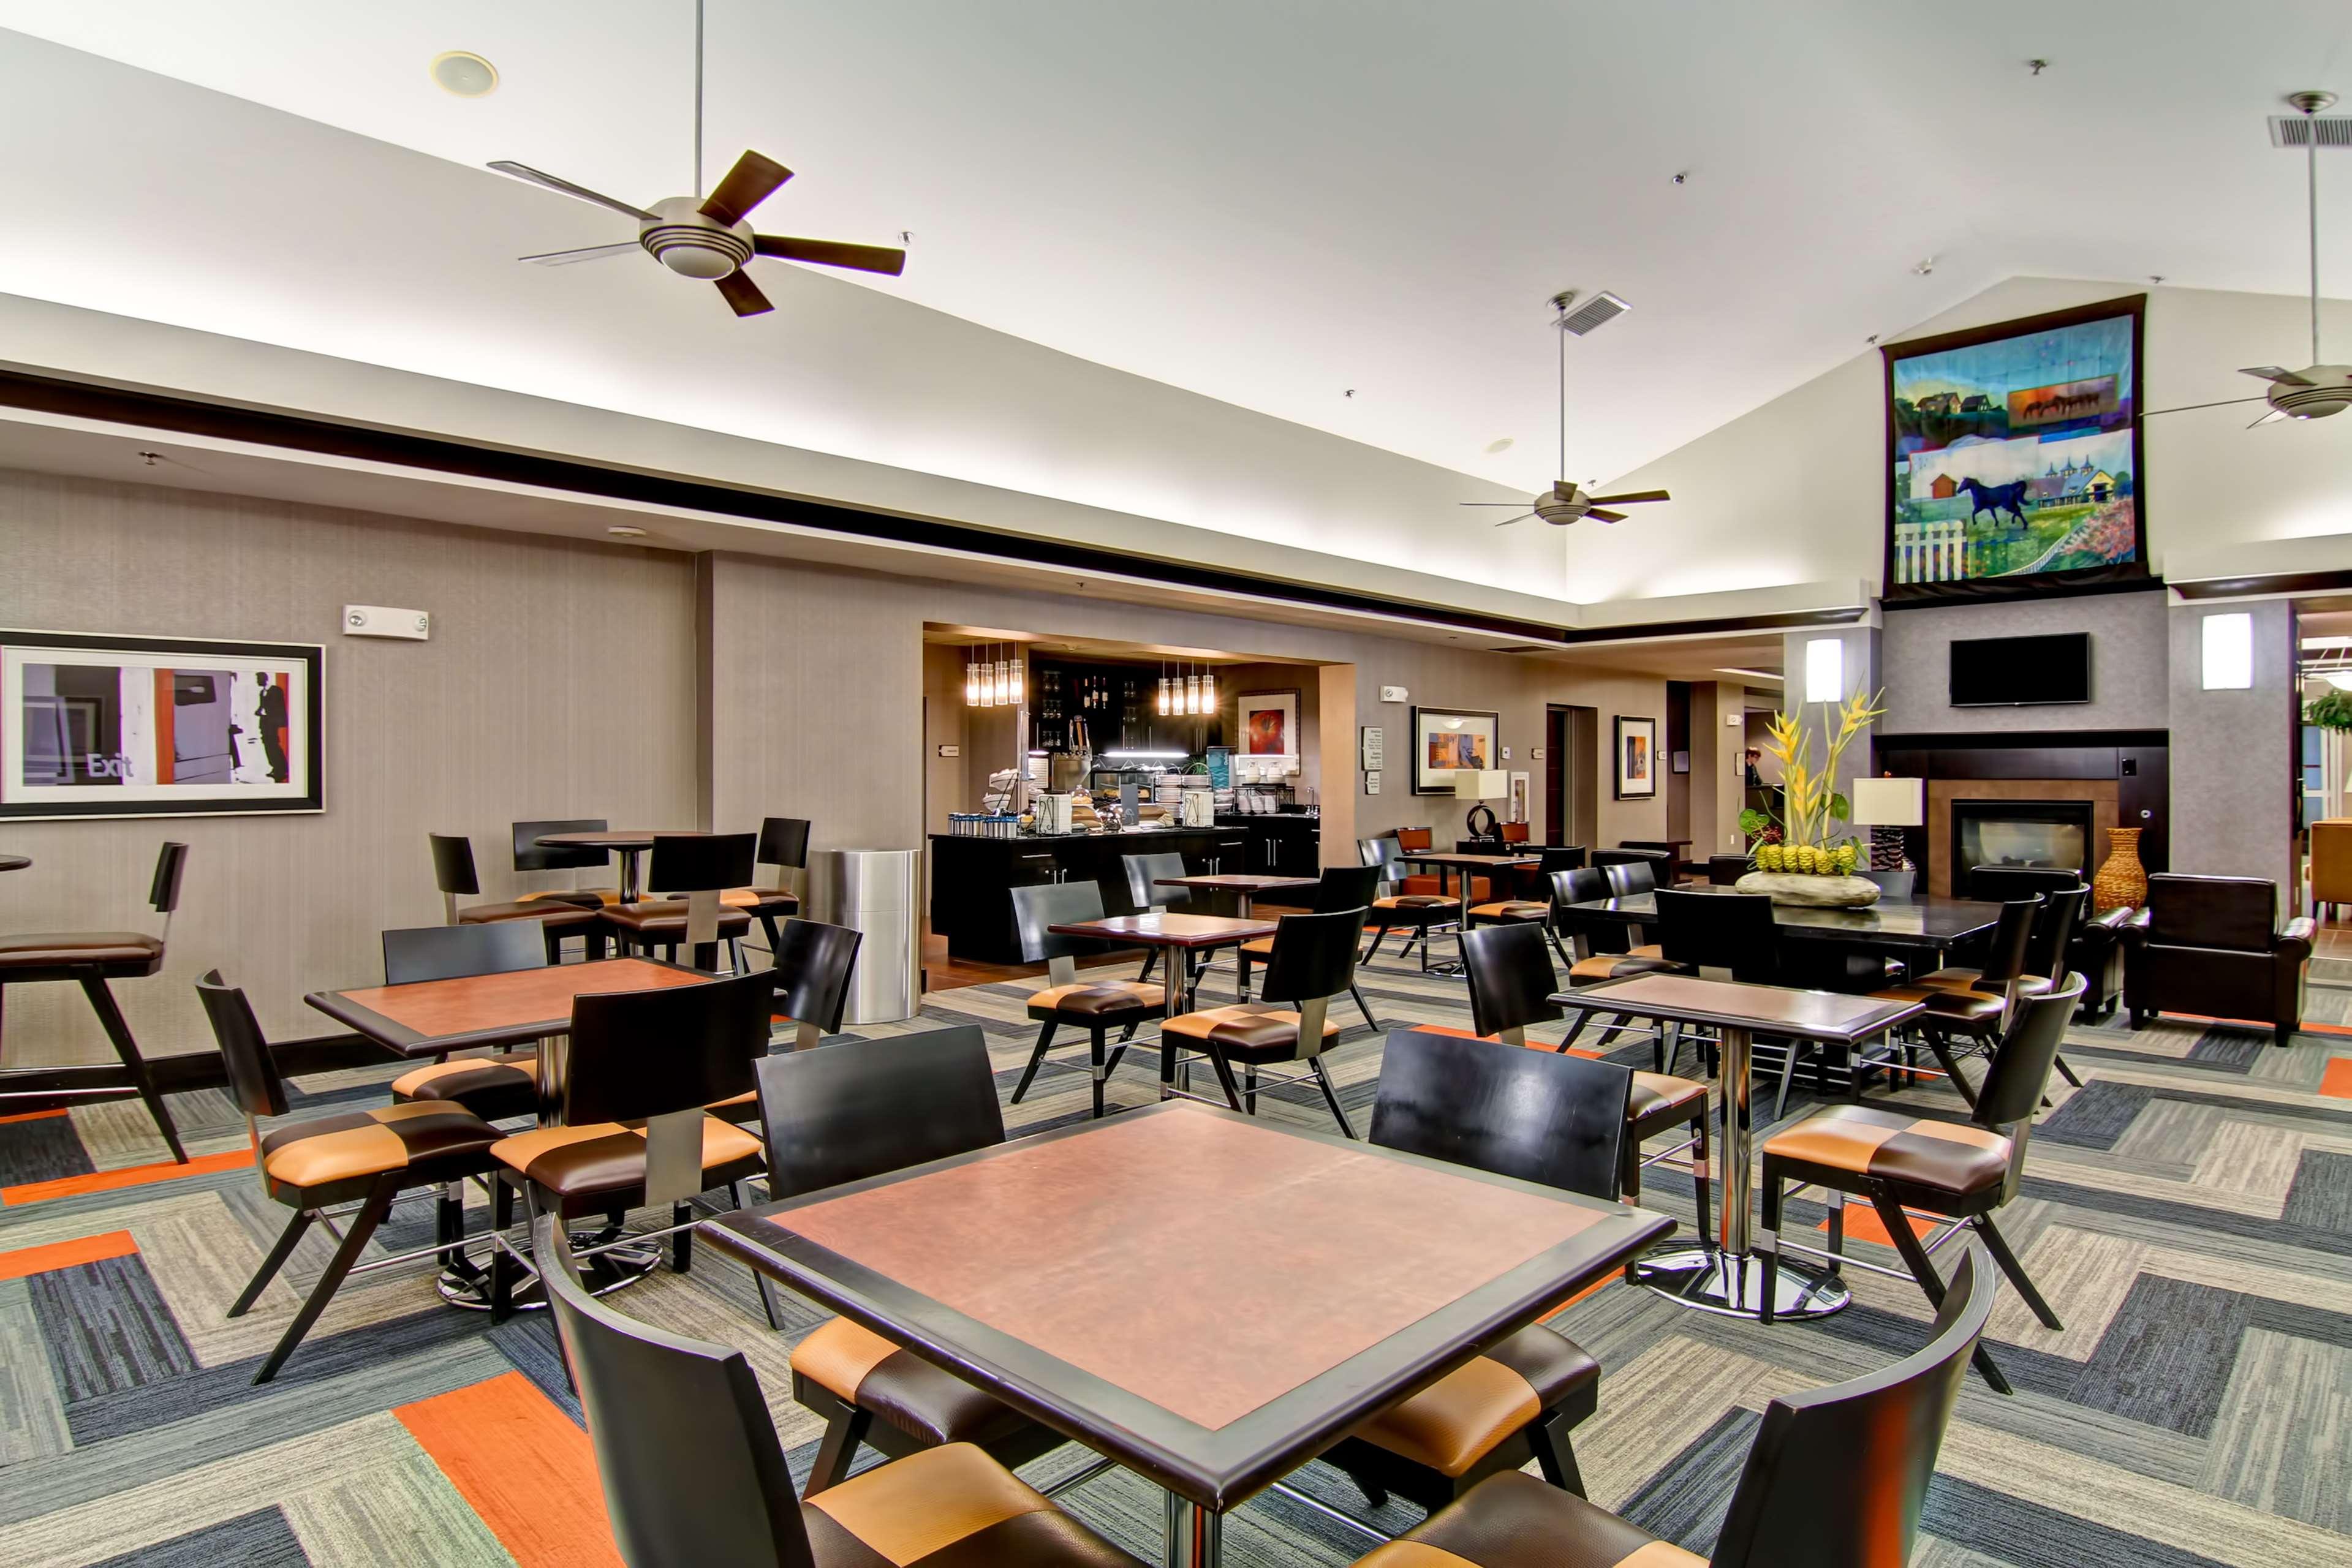 Homewood Suites by Hilton Cincinnati Airport South-Florence image 8